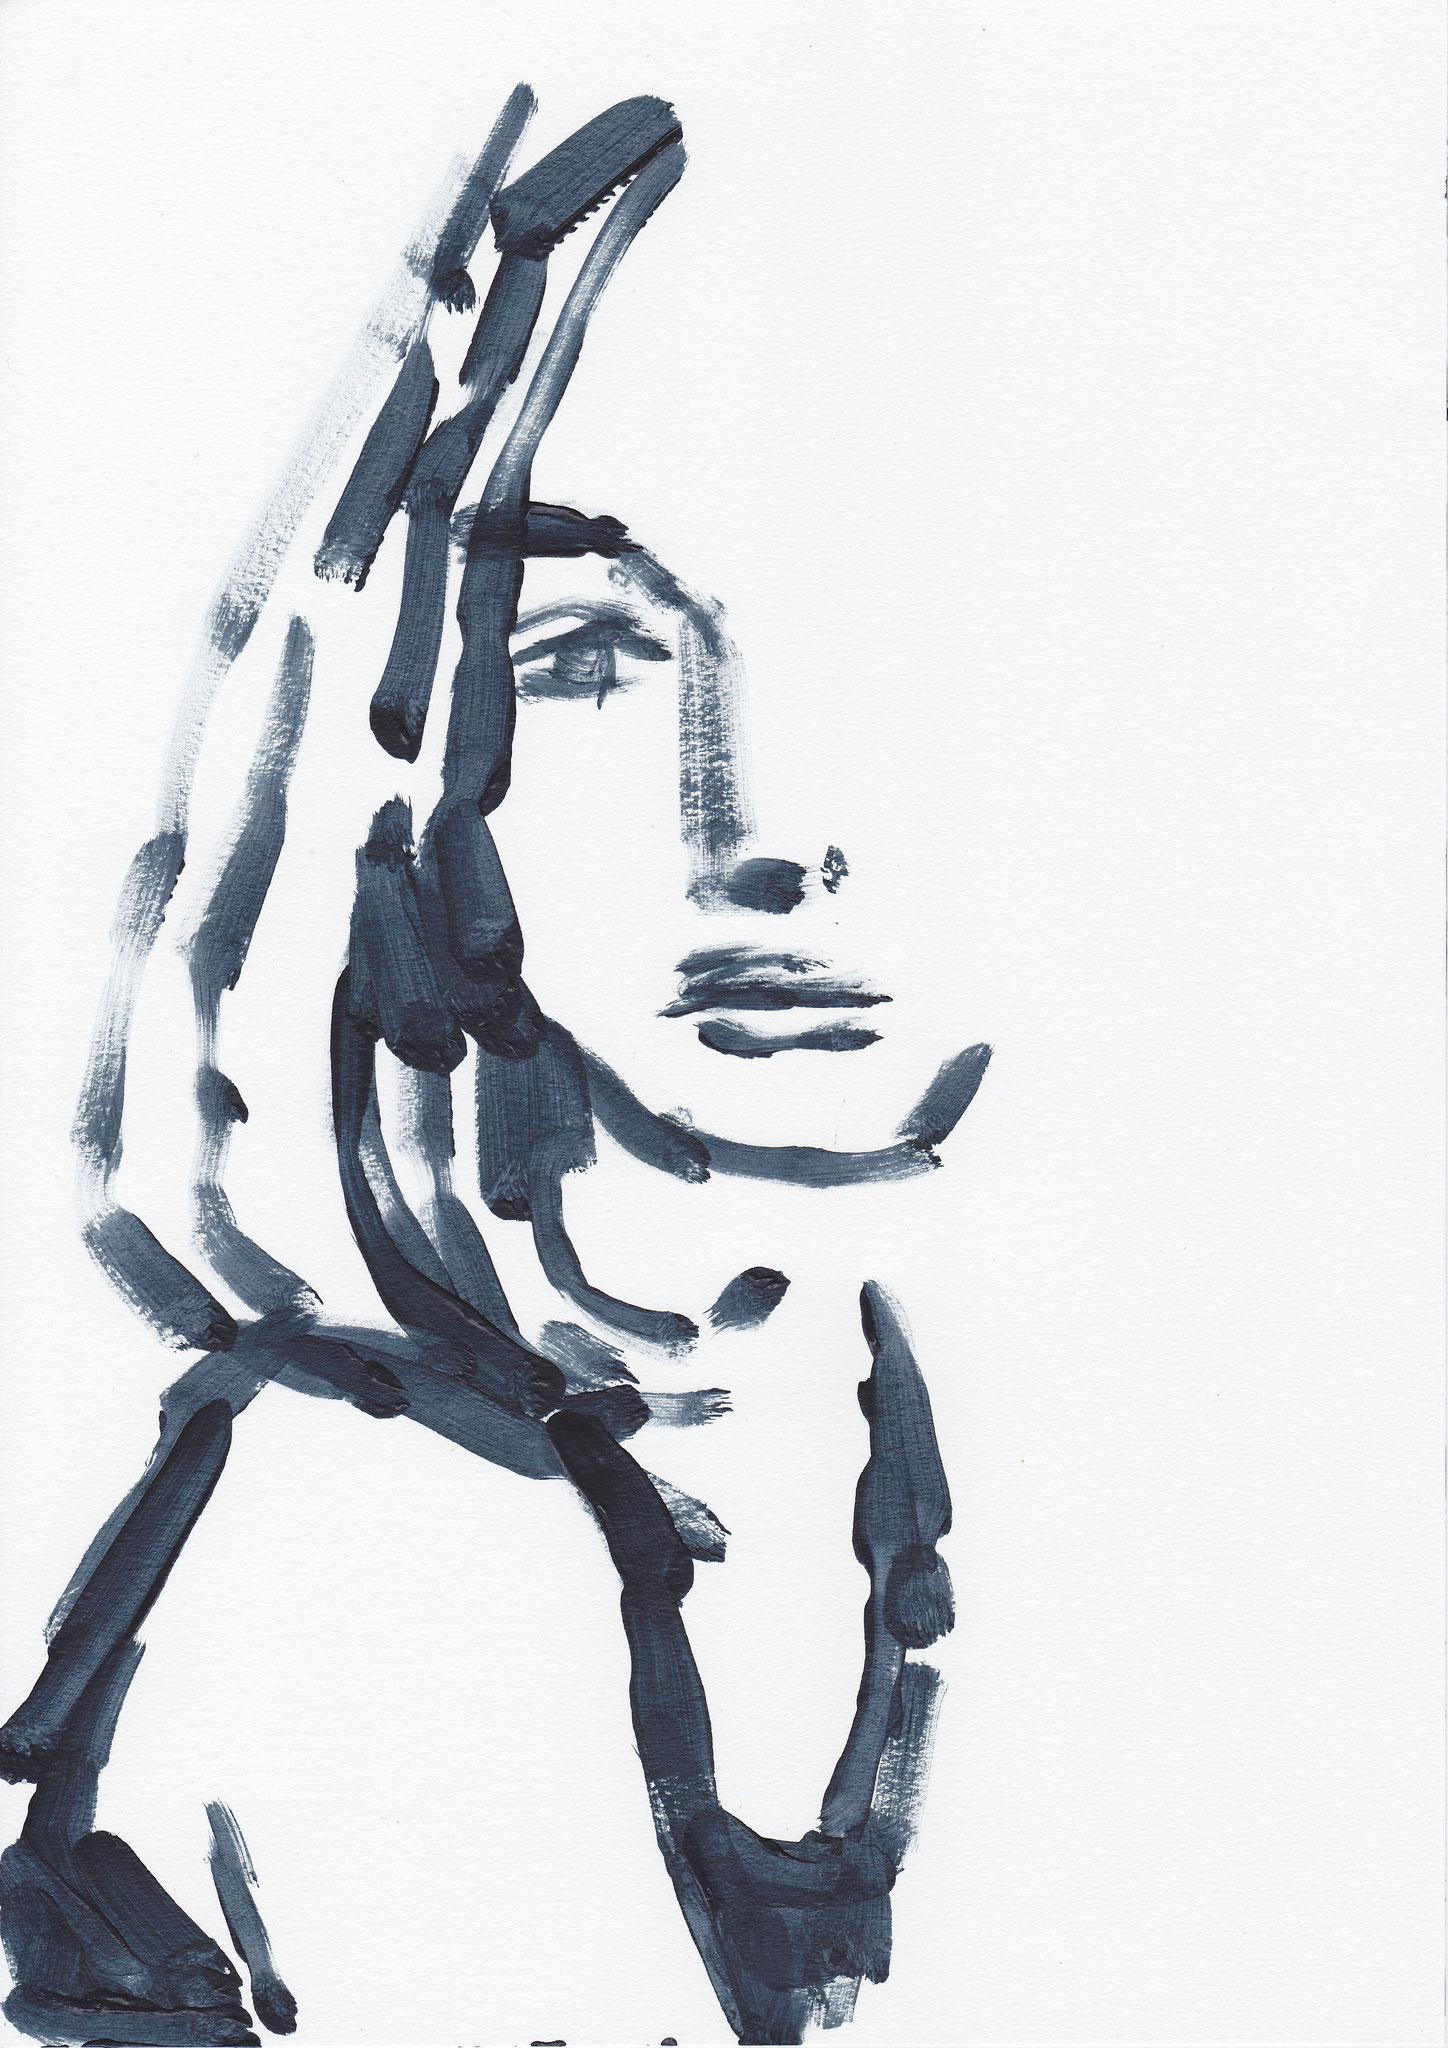 022 , acrylic on paper , 29.7 x 21cm , Selina Saranova